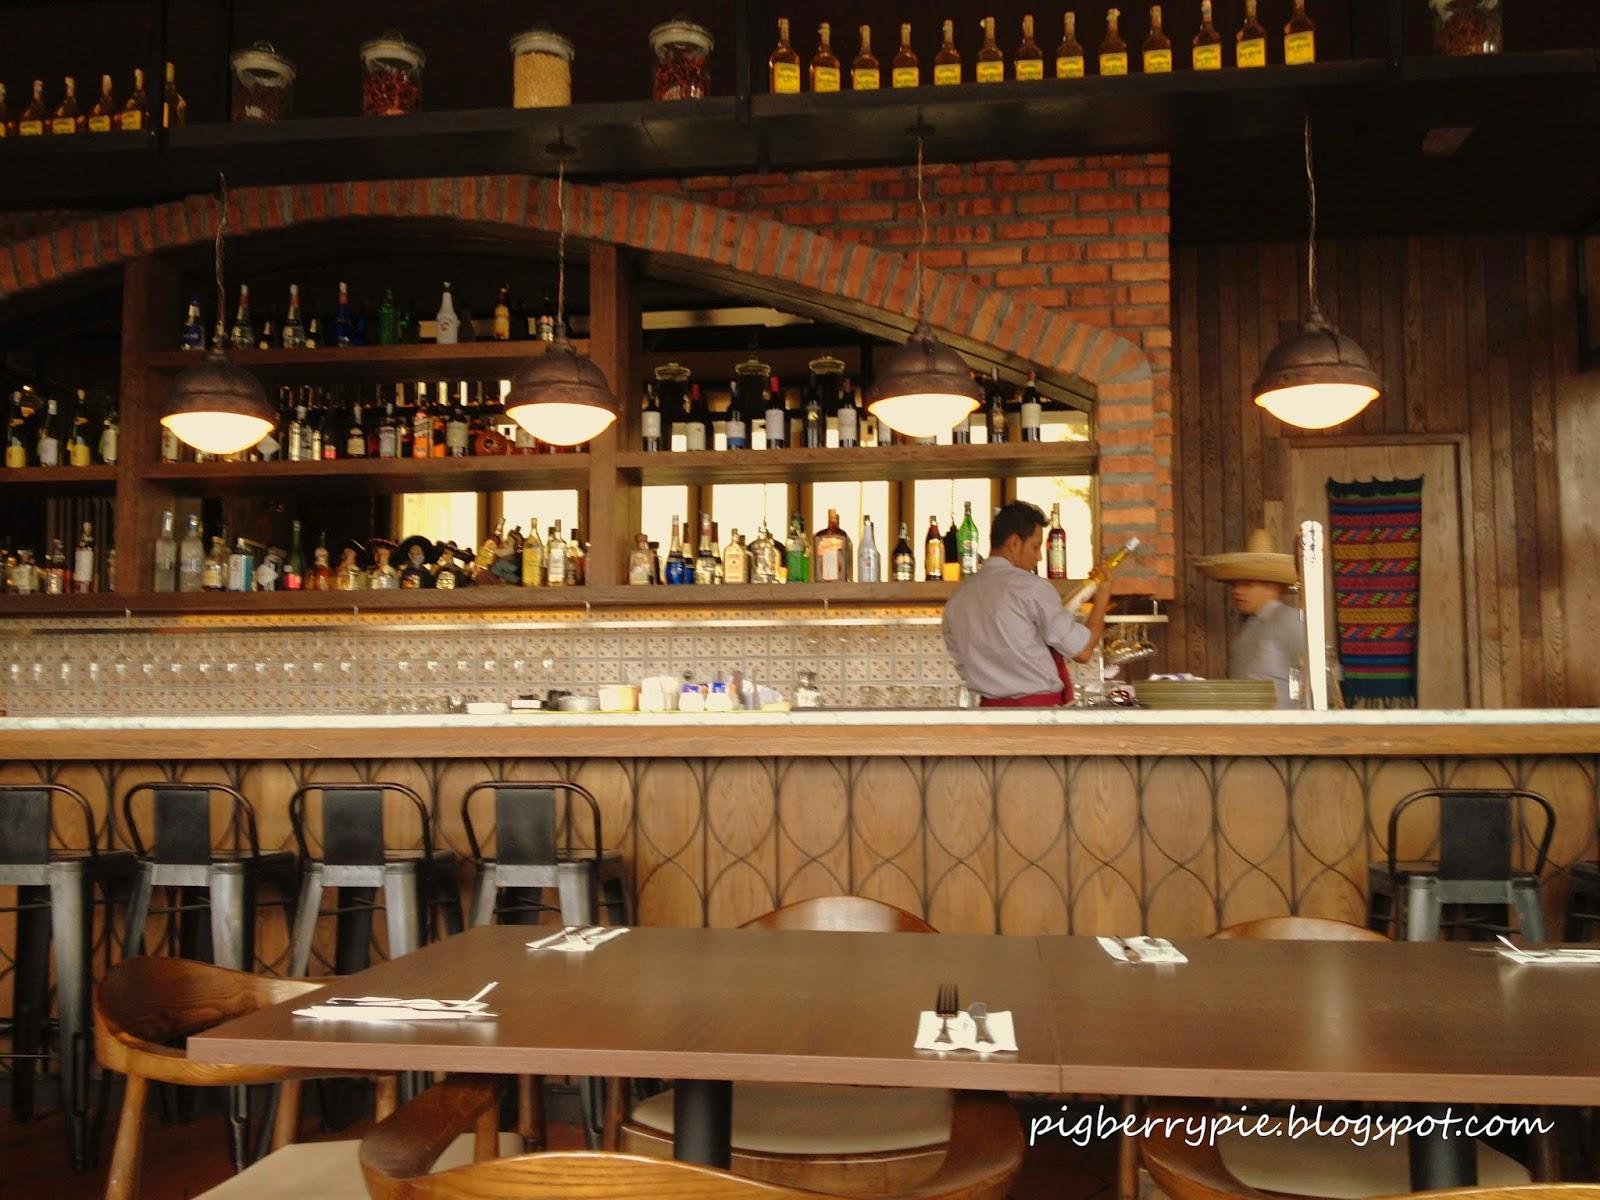 Fresca Mexican Kitchen & Bar @ The Garden, Mid Valley City | Pigberrypie